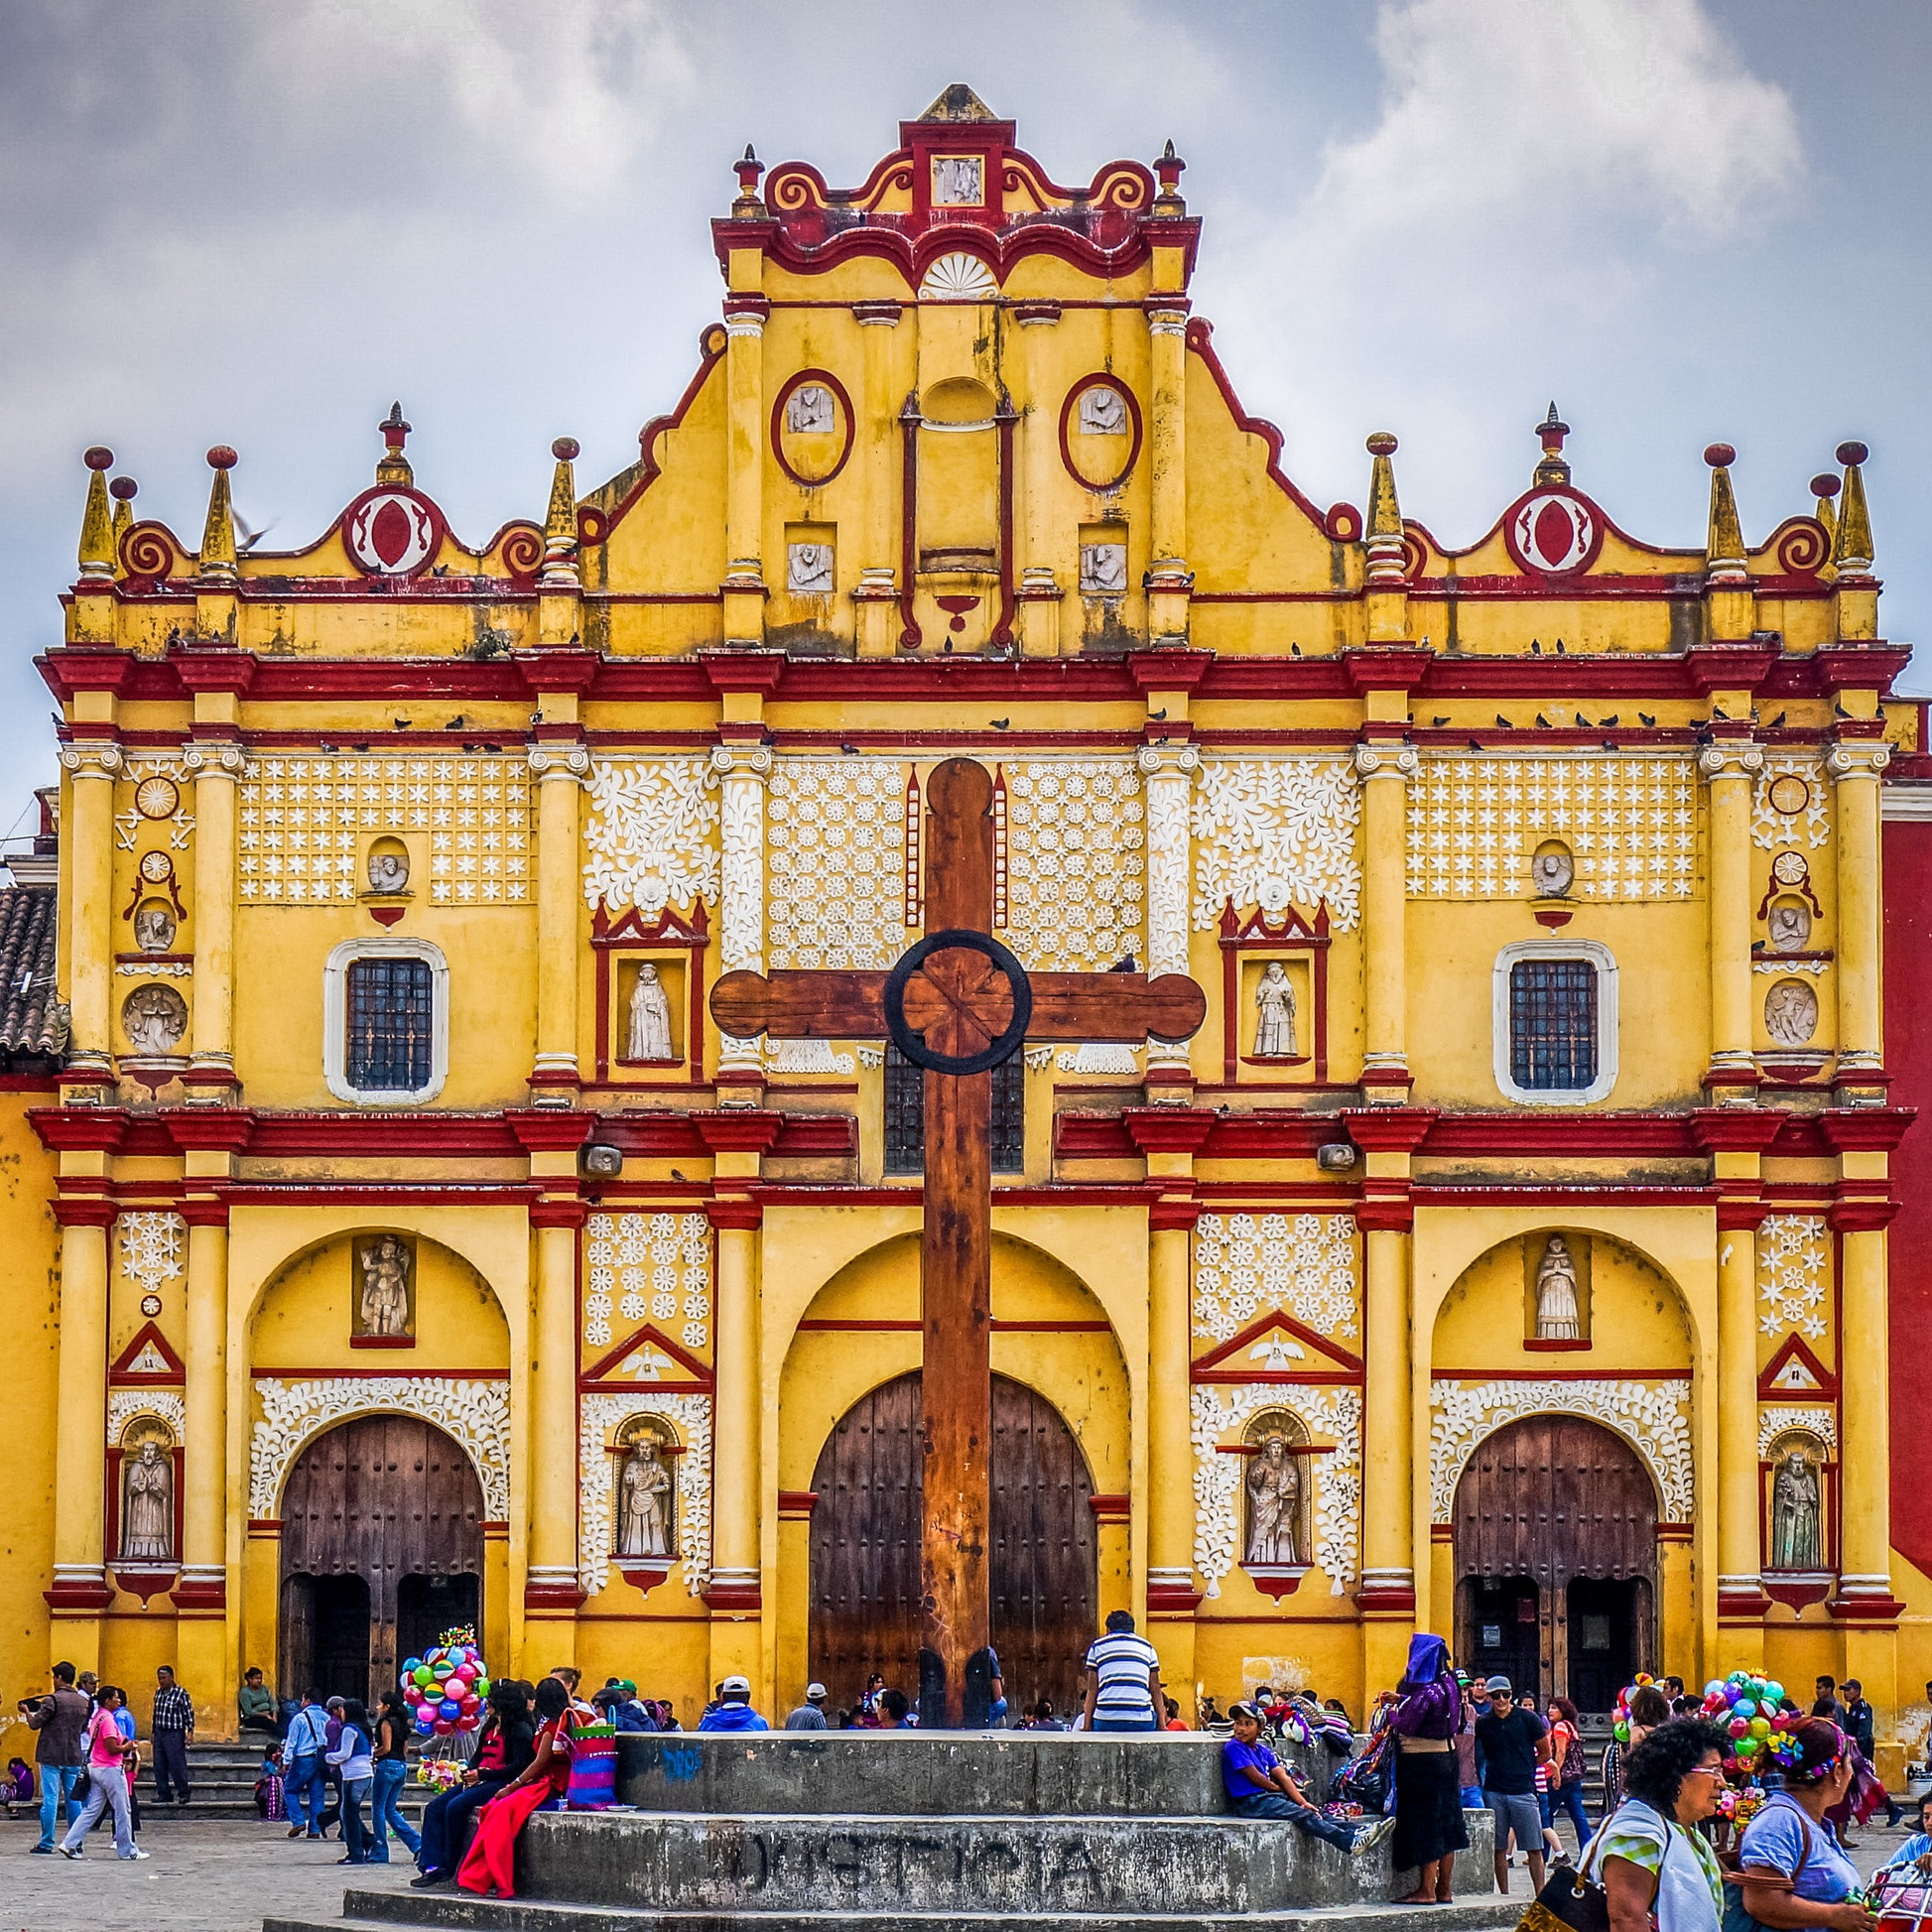 Catedral de San Cristóbal - San Cristobal de las Casas